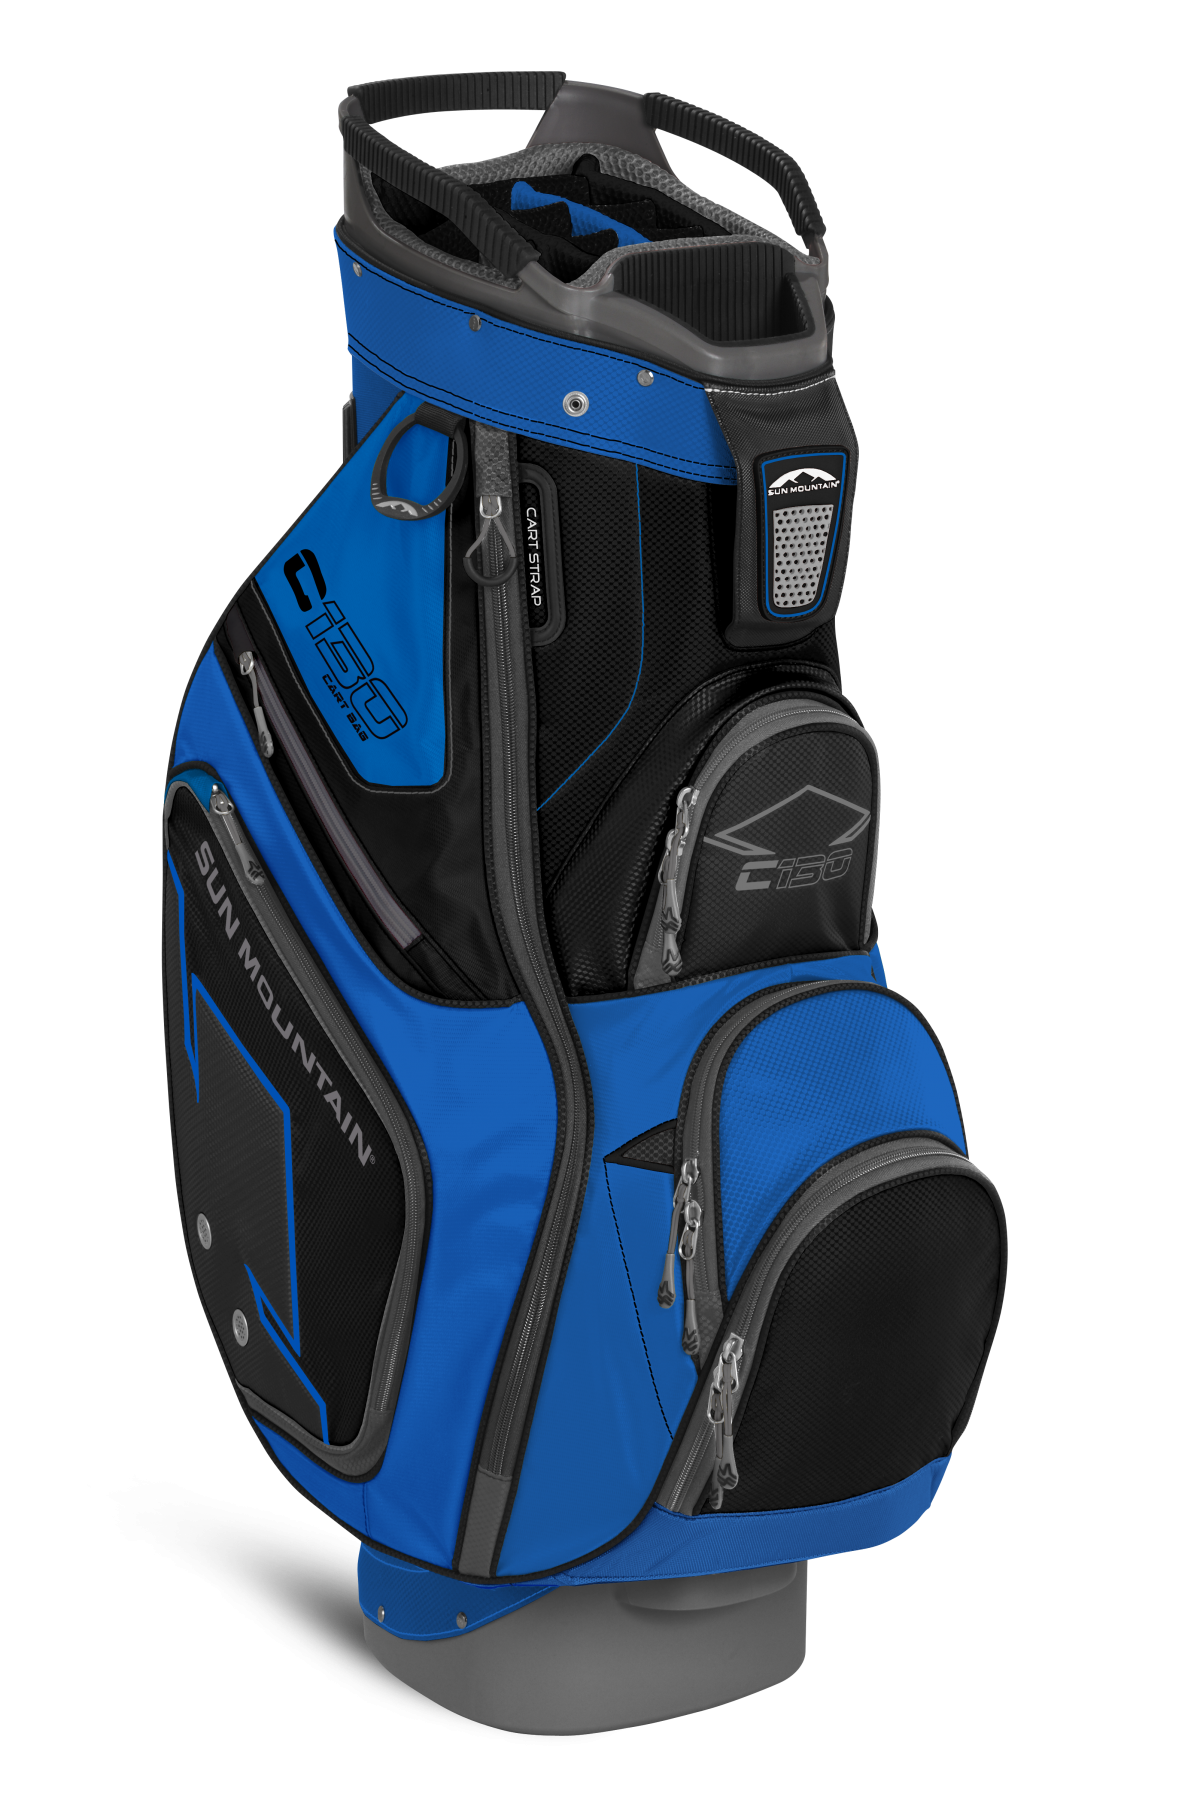 Sun Mountain C130 2015 Cart Bag Golf Ski Warehouse Ladies Golf Bags Golf Golf Bags For Sale